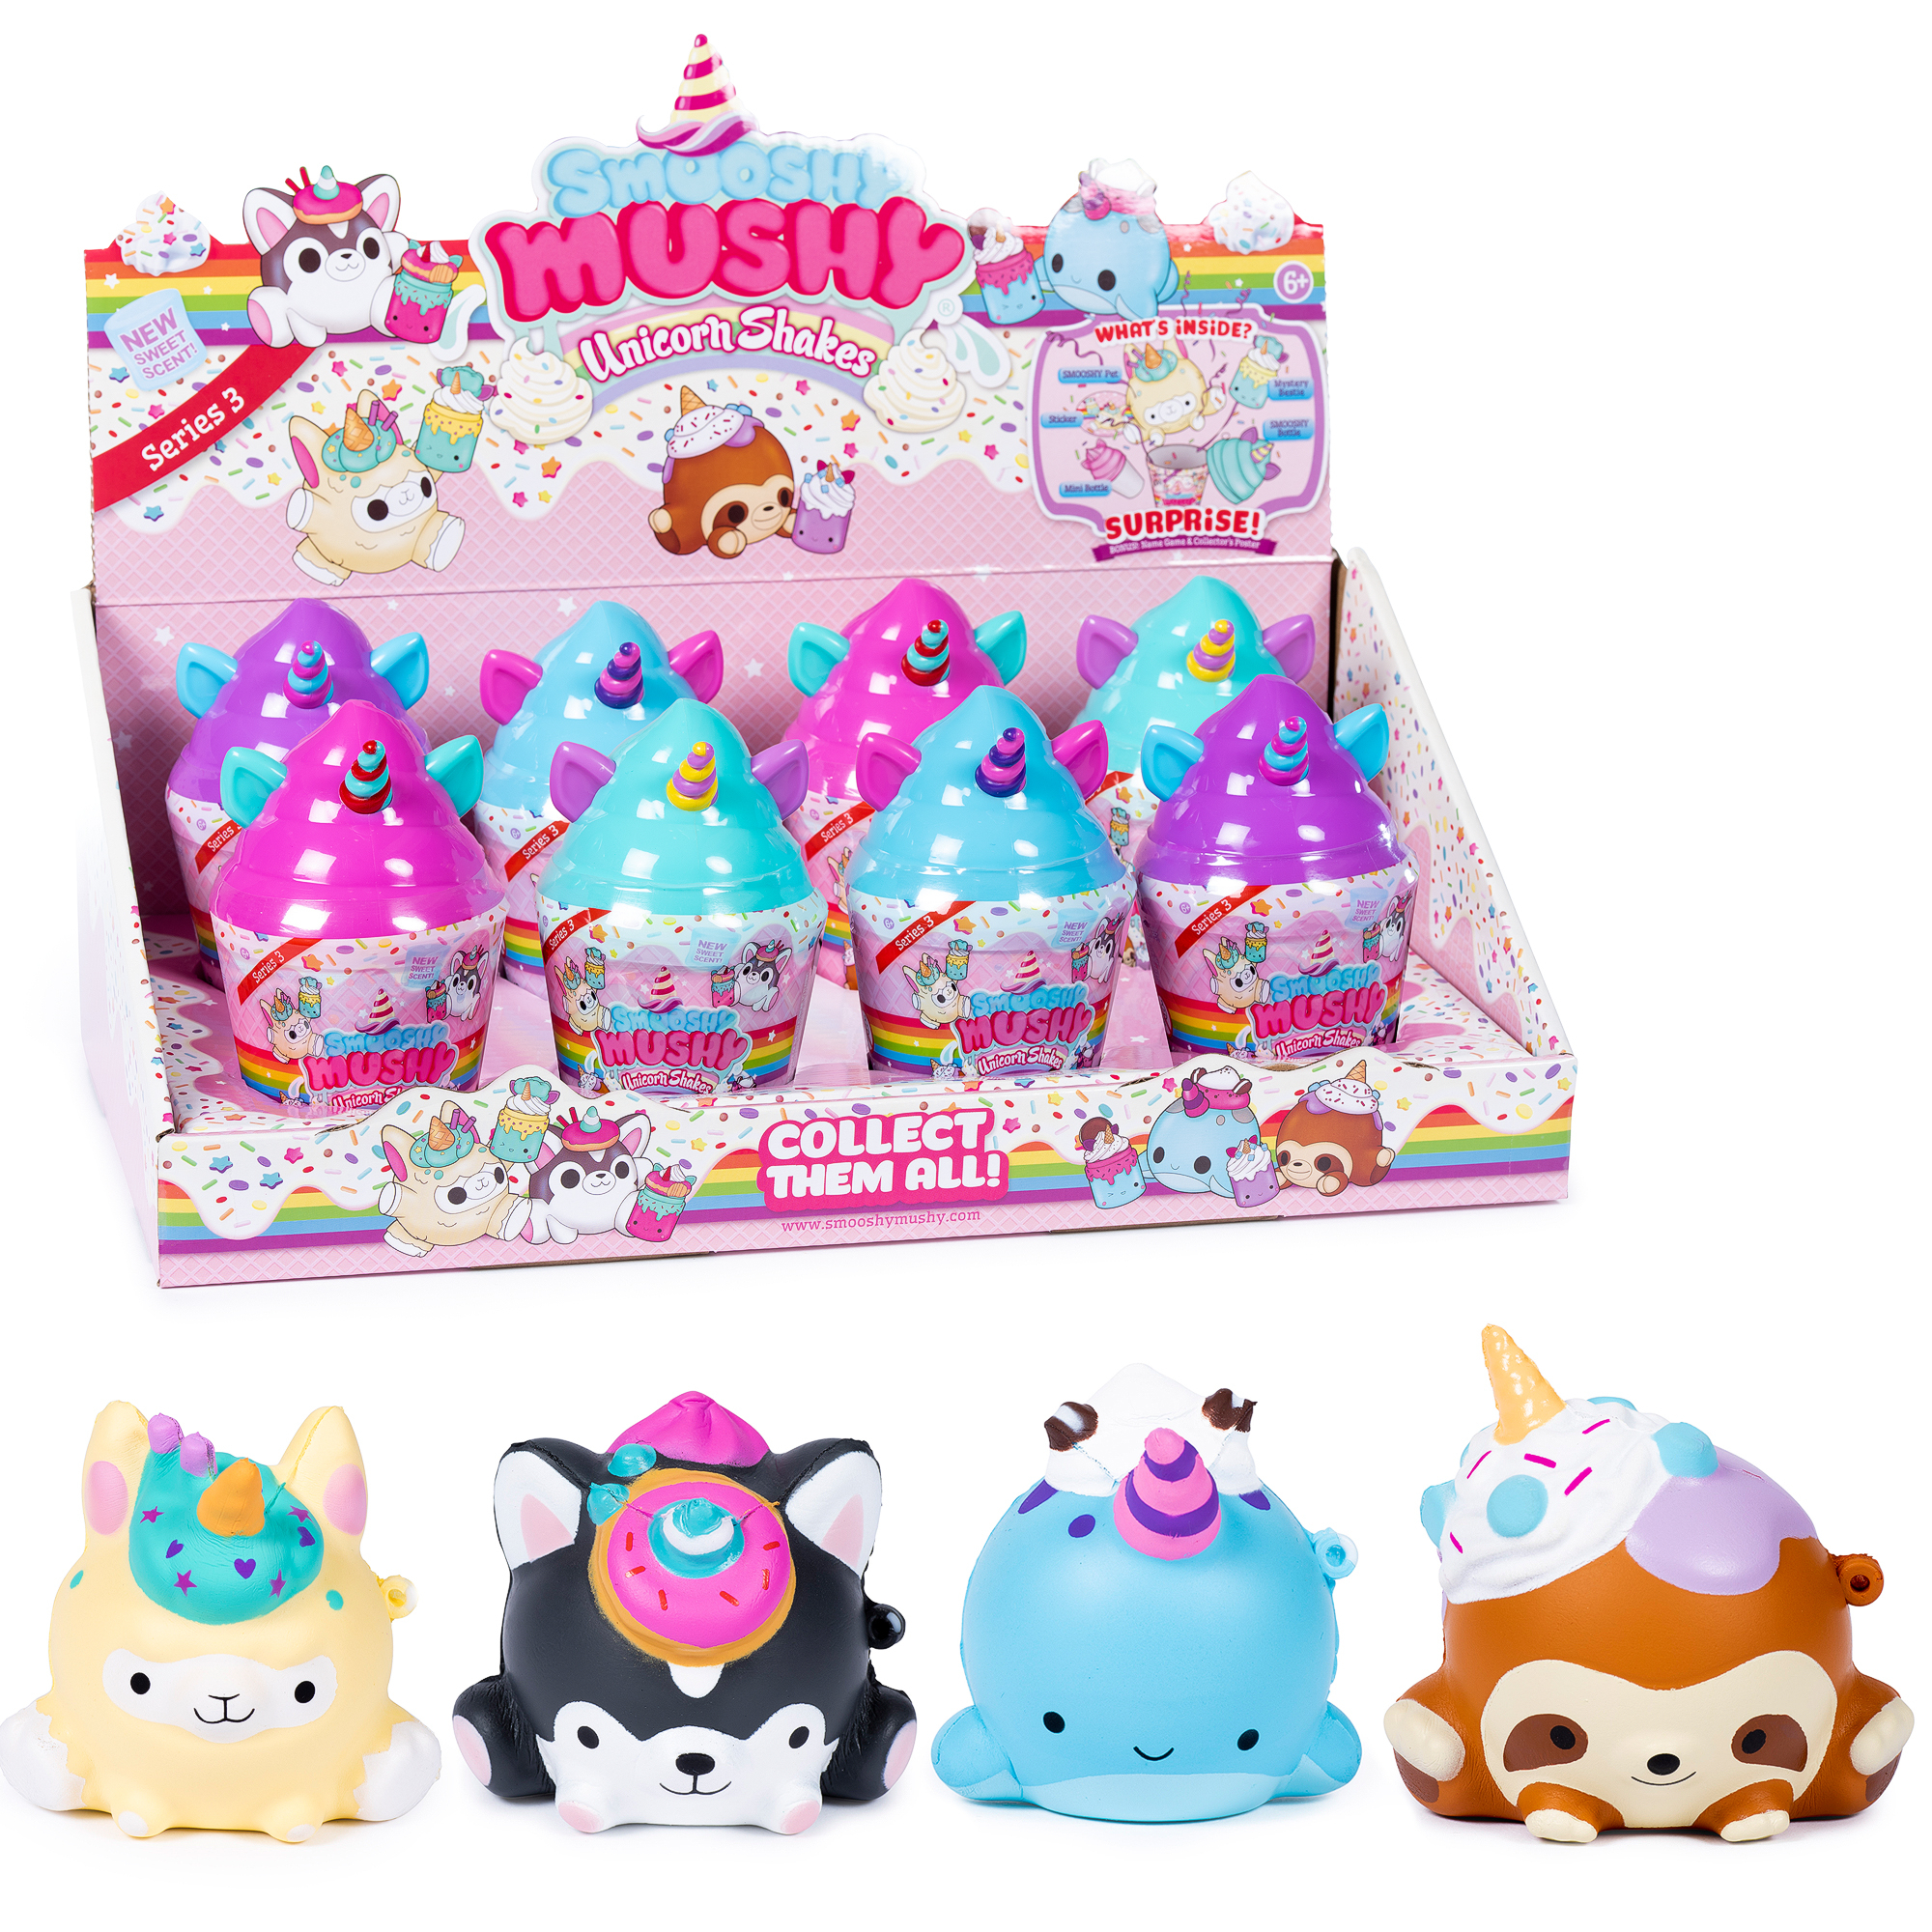 Игрушка Smooshy Mushy Frozen Delight. Десертный коктейль smooshy mushy игрушка антистресс smooshy mushy core питомец 2 серия